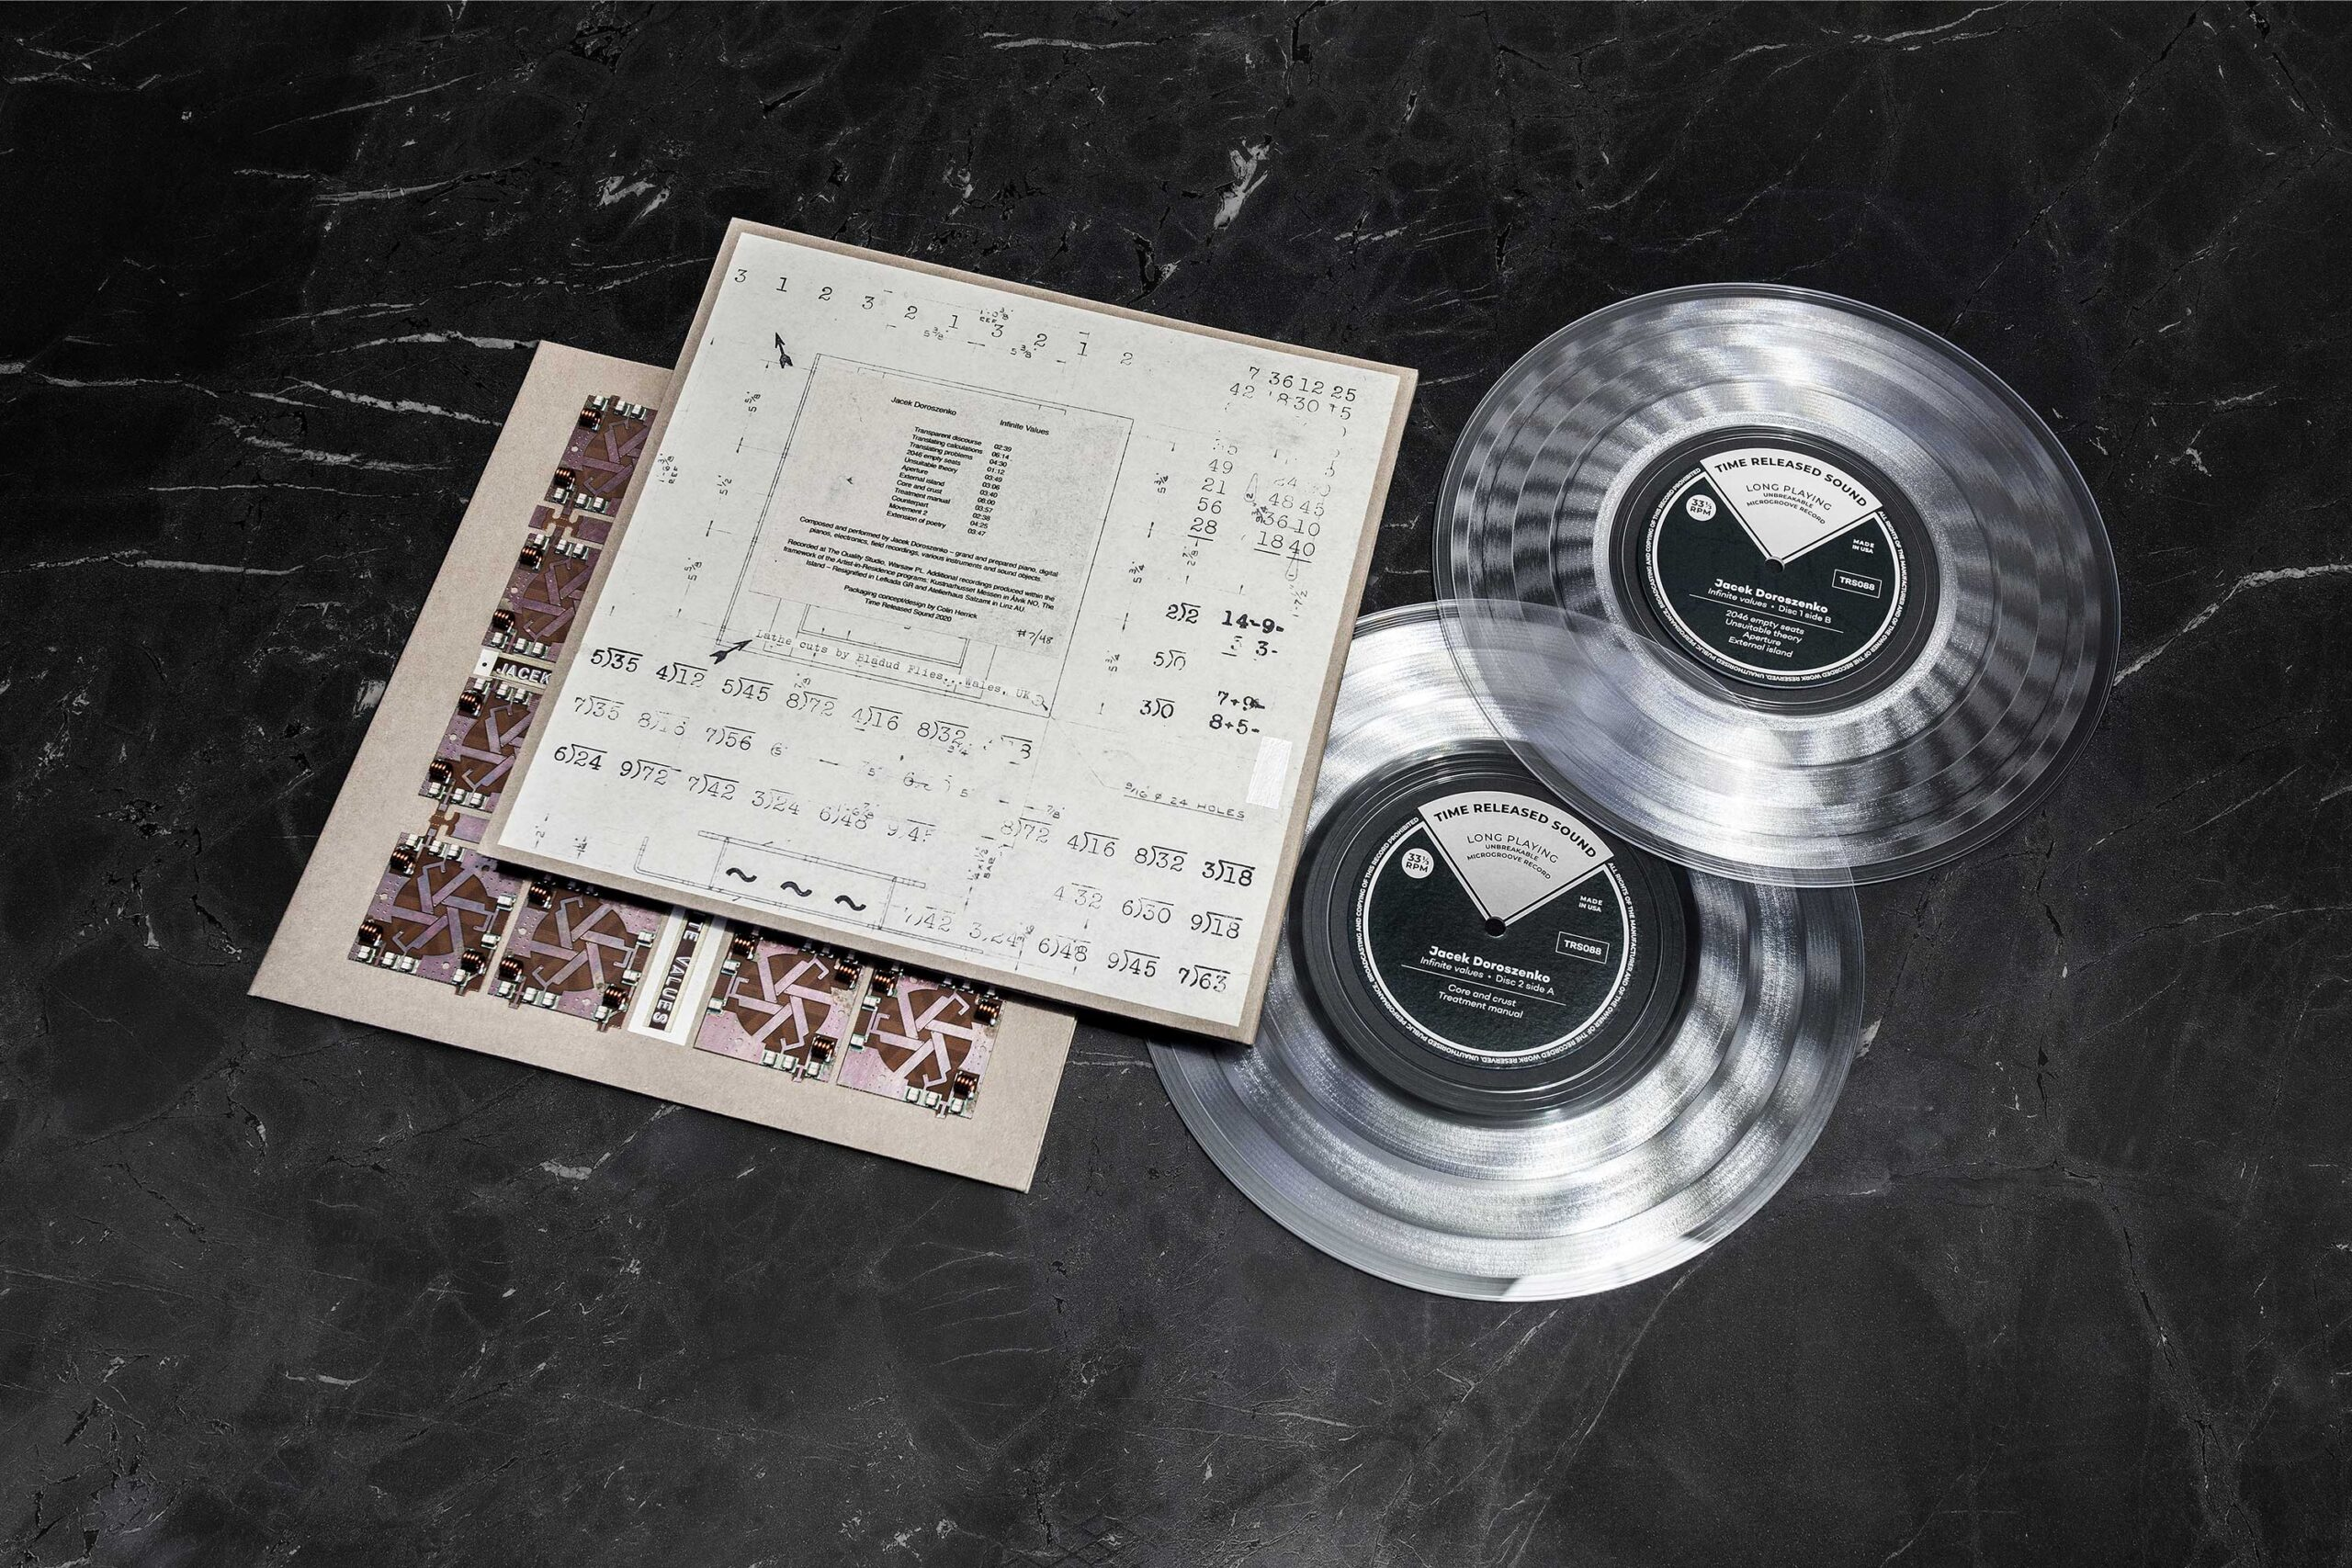 Jacek Doroszenko - Infinite Values, contemporary music album 03